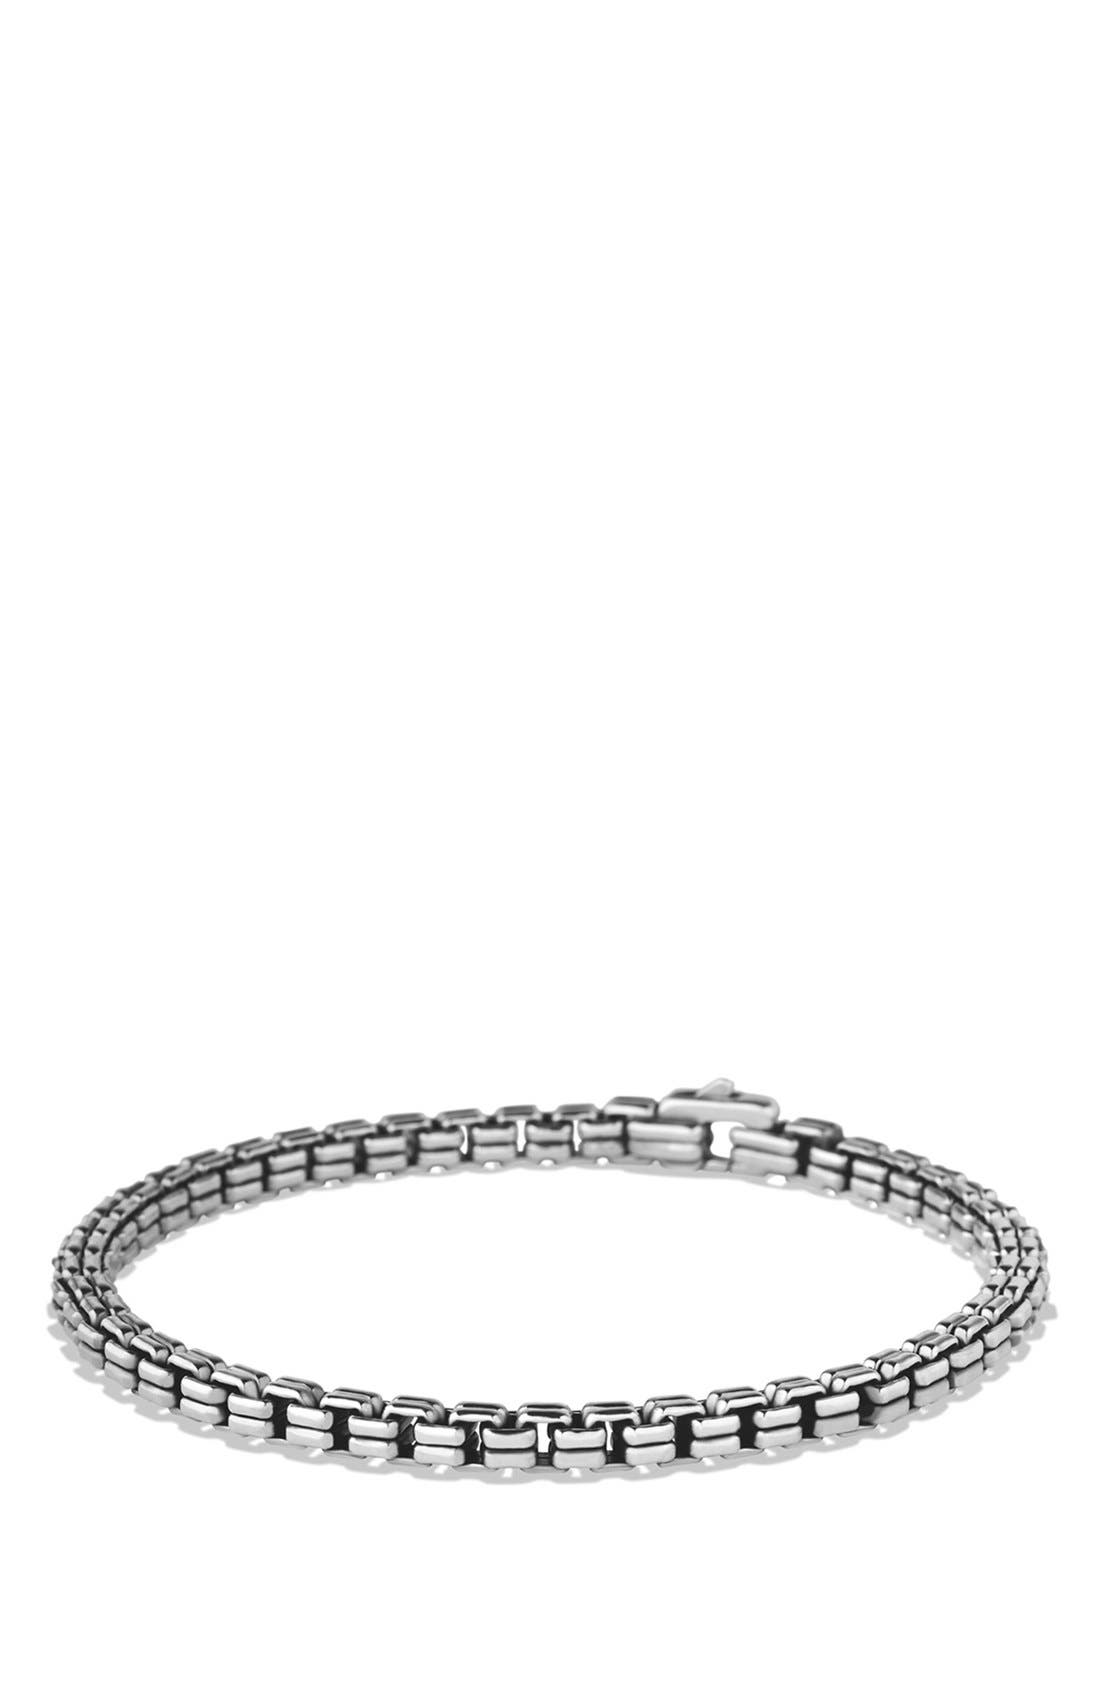 David Yurman 'Chain' Double Box Chain Bracelet